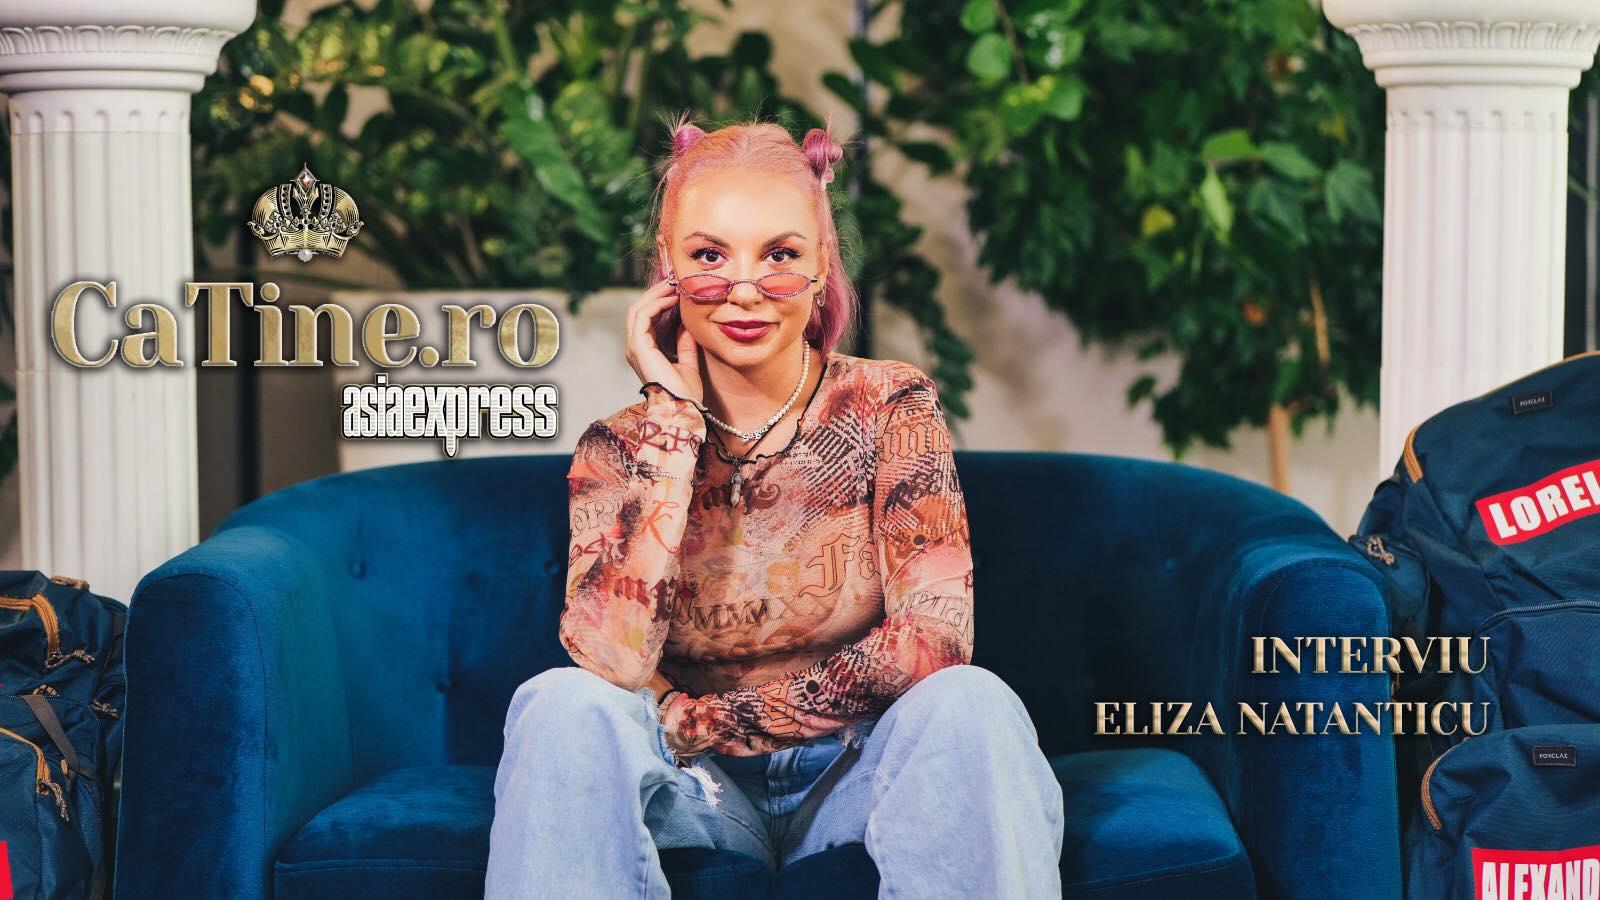 CaTine.ro - Interviu - Eliza Natanticu